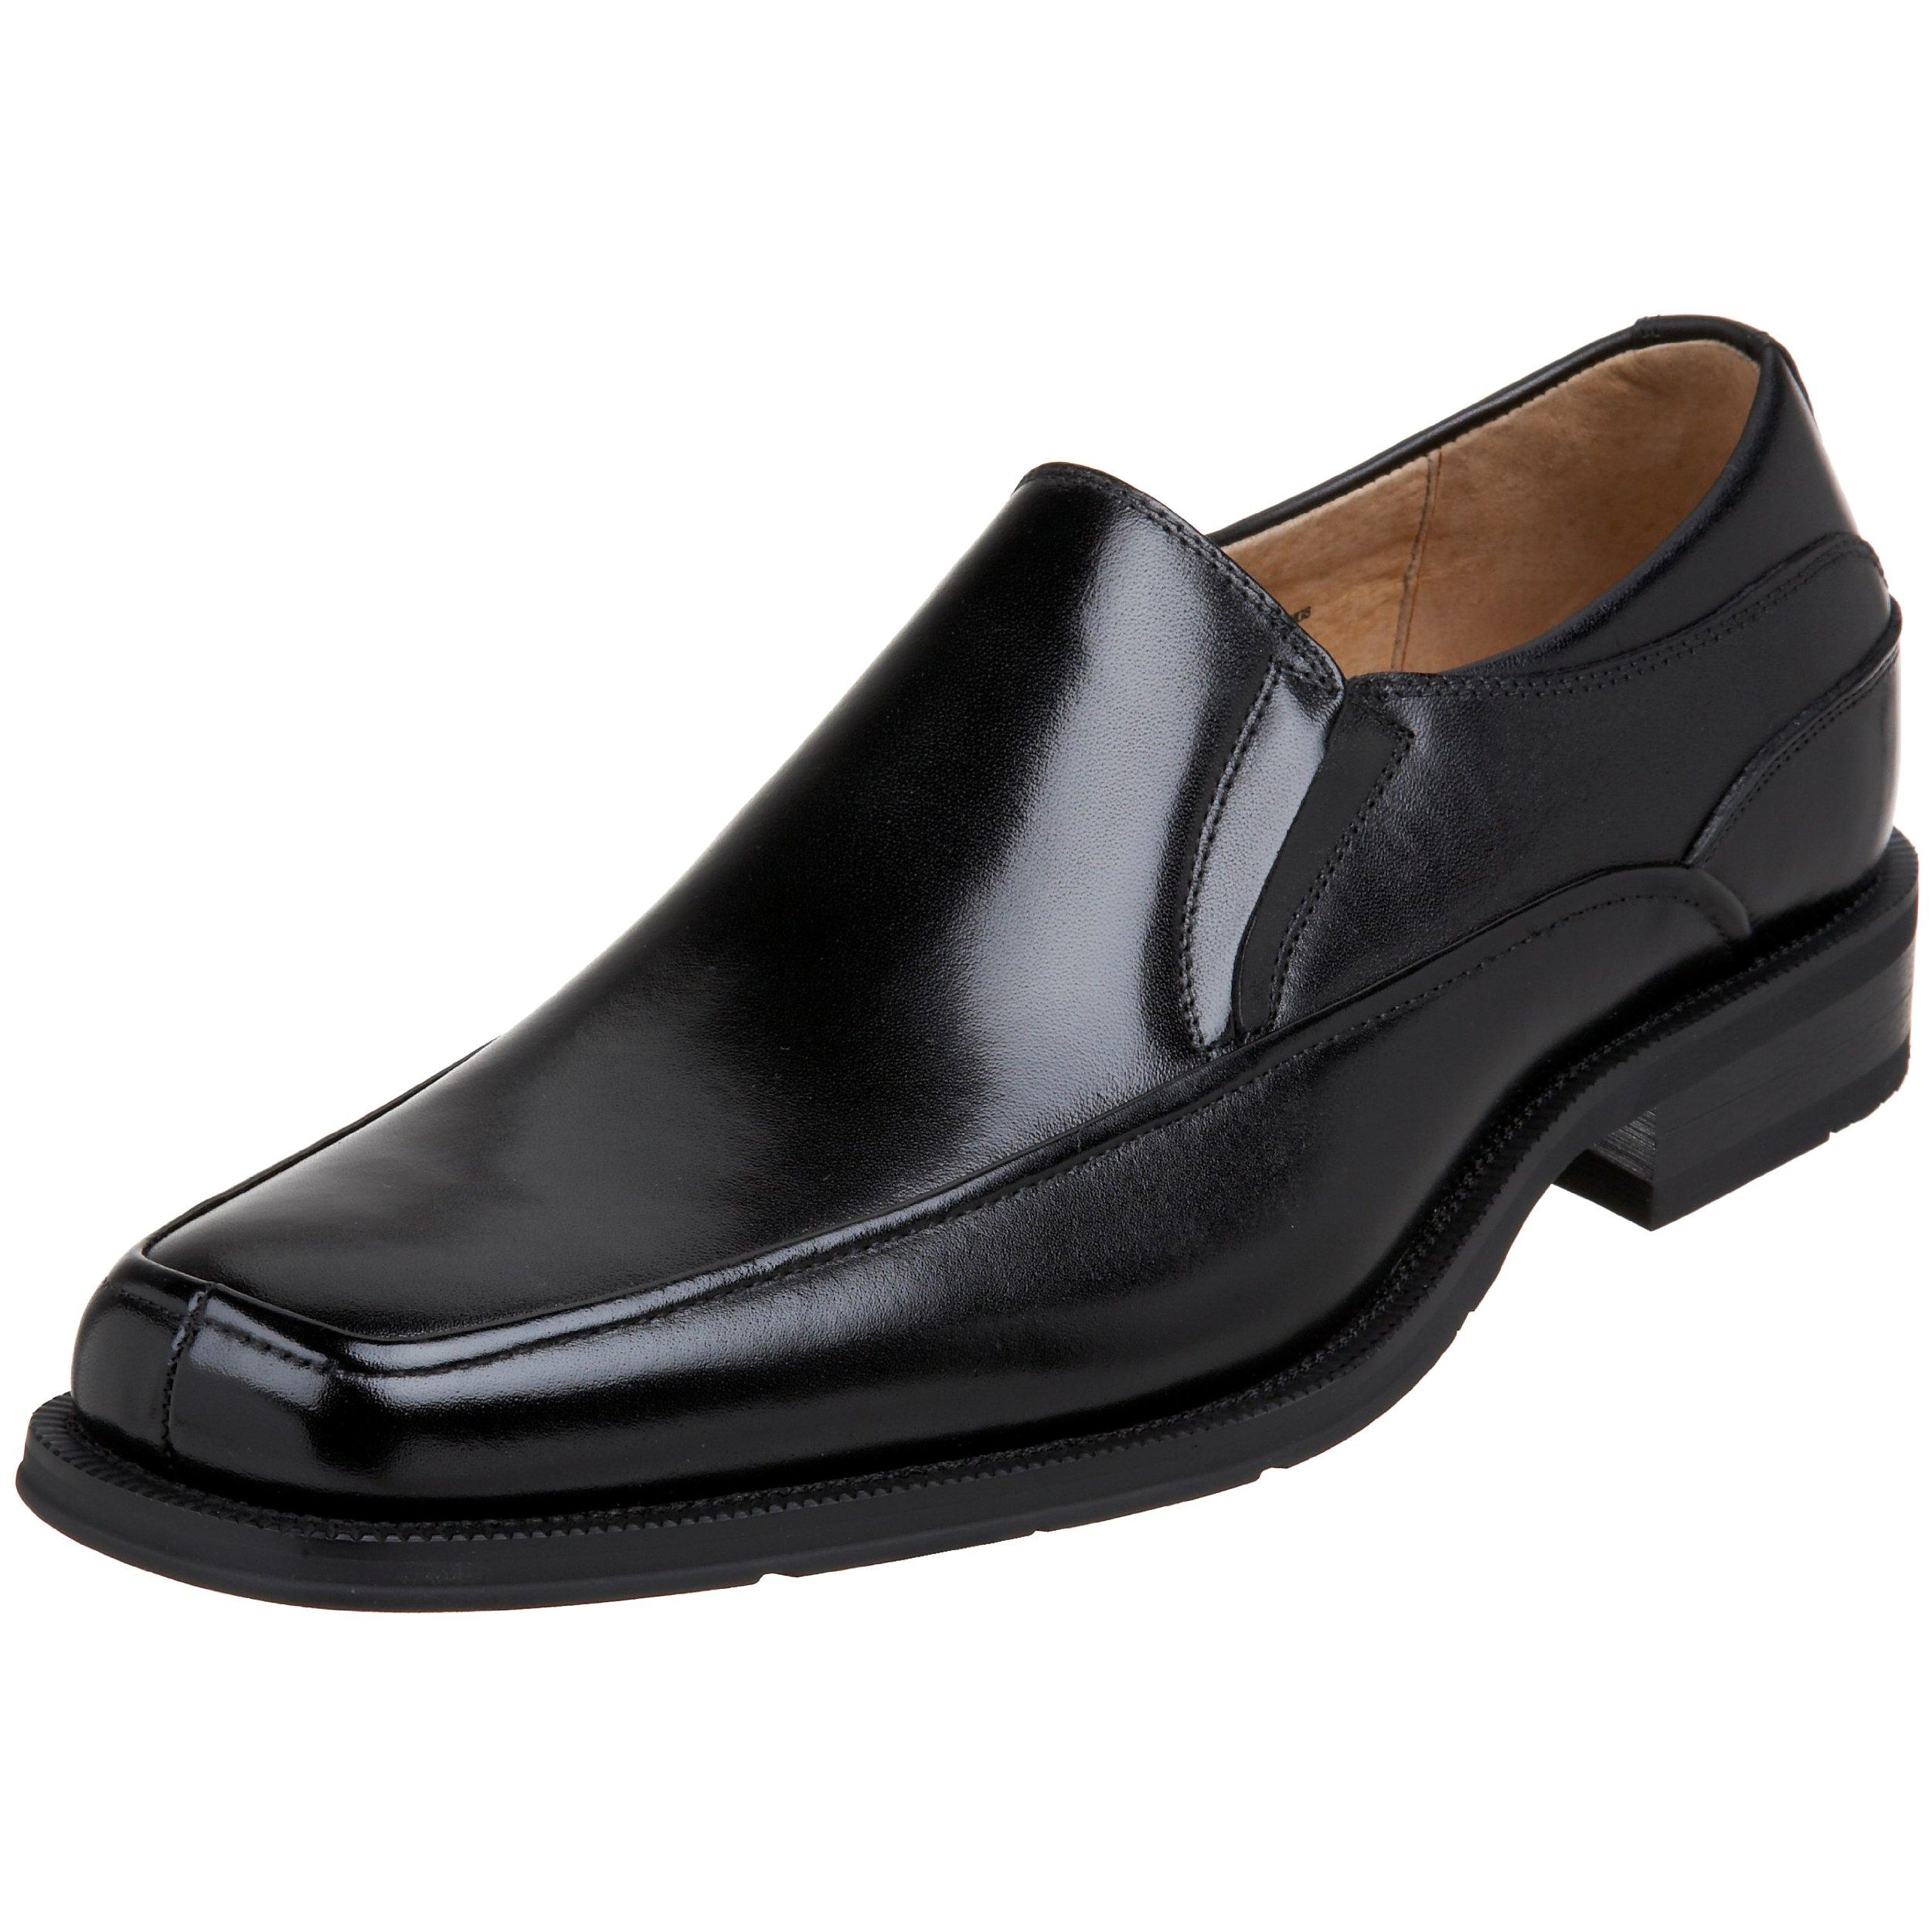 Florsheim Men's Corvell Slip-On,Black,11.5 EEE by Florsheim